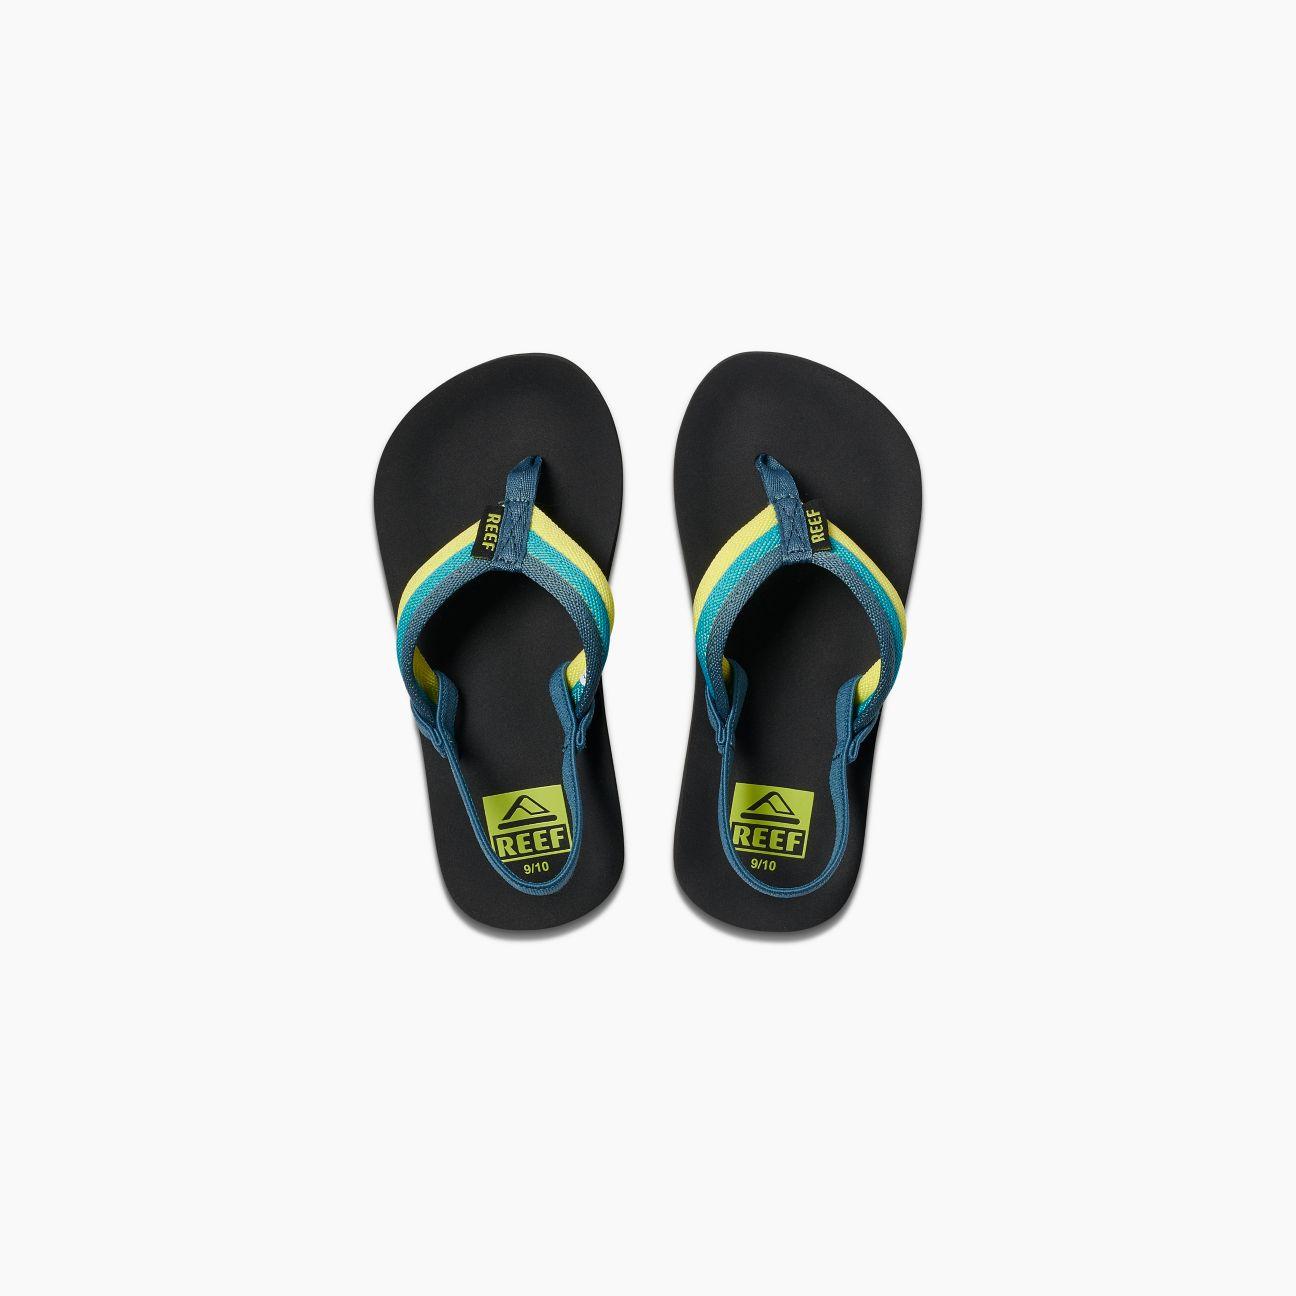 c7ead6706b4c Reef Little Kid s Ahi Beach Sandal Blue Green